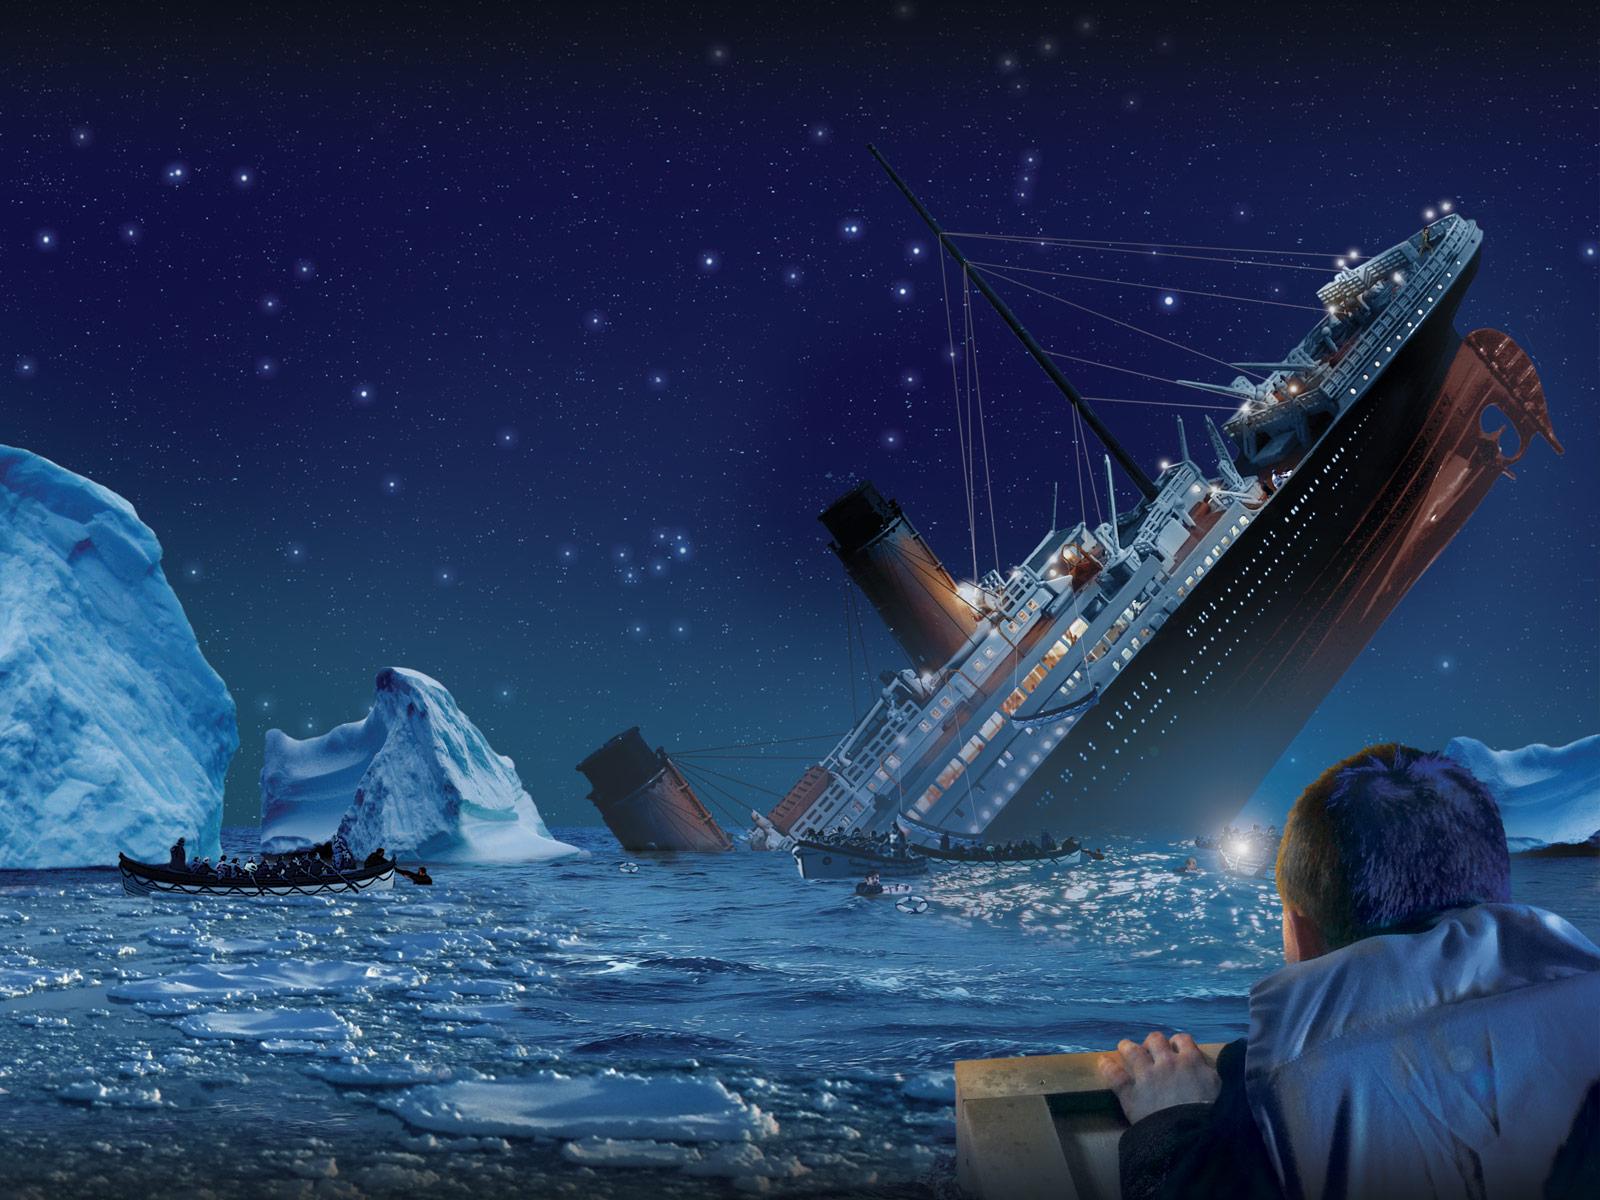 Sink Titanic Animated - Sink Titanic Animated